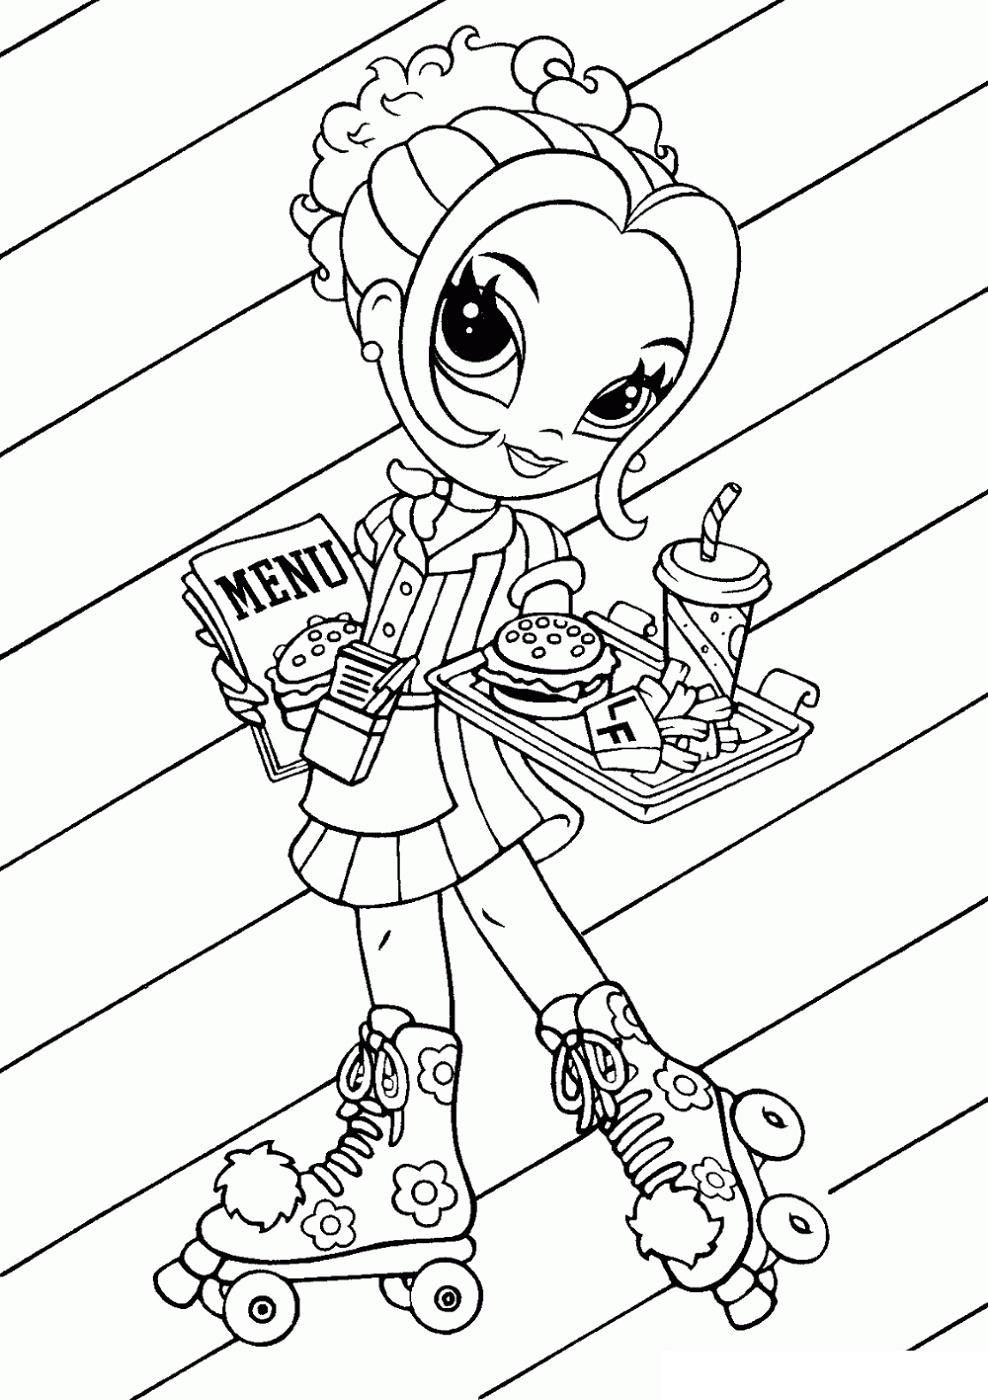 Lisa Frank Coloring Book K5 Worksheets Lisa Frank Coloring Books Unicorn Coloring Pages Coloring Books [ 1400 x 988 Pixel ]